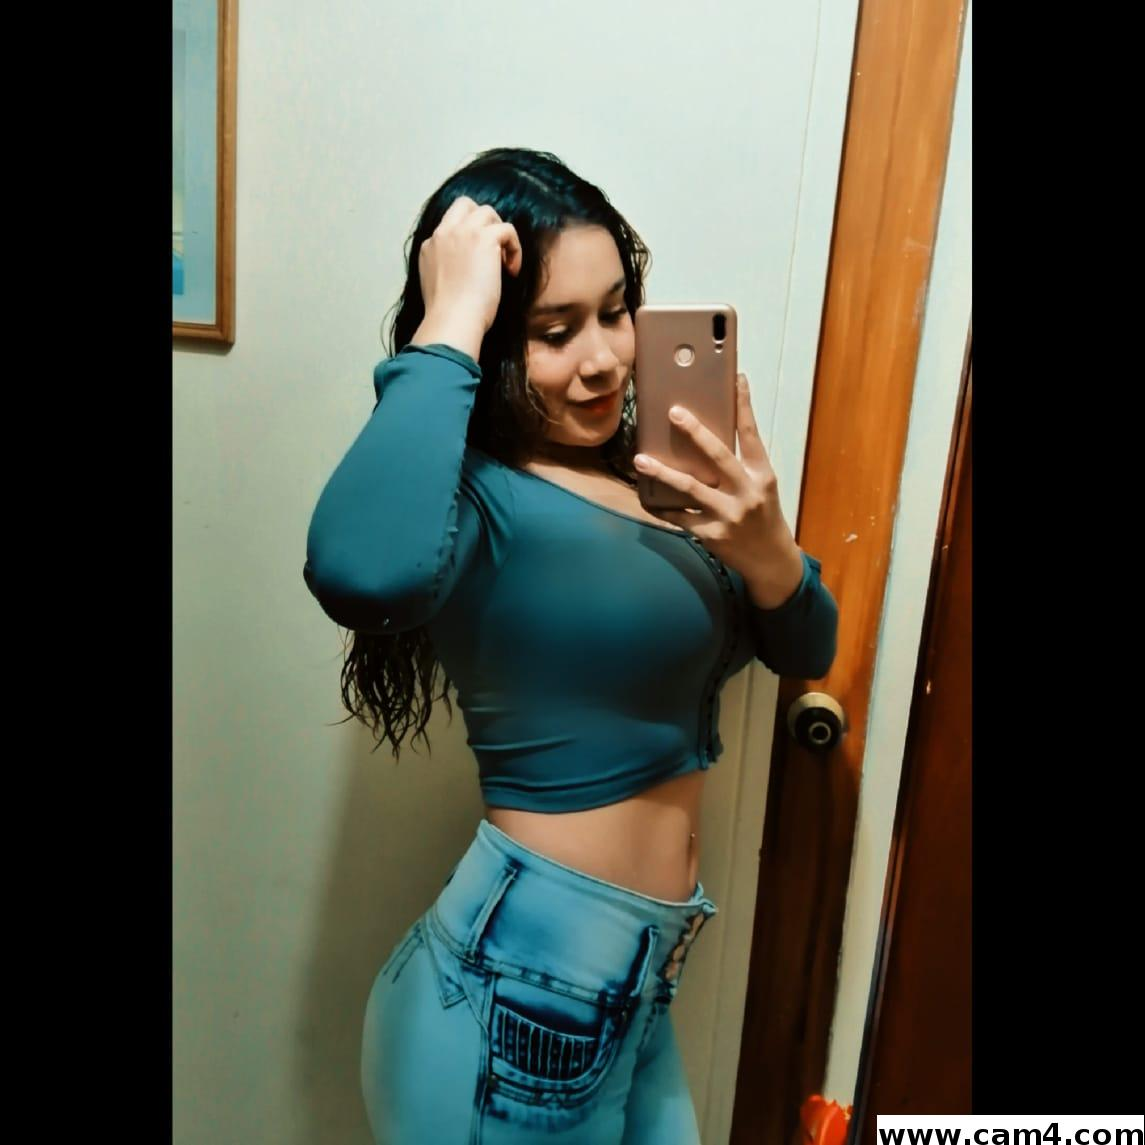 Samantha3 ?s=xzdtbda848c2rfovyz0hqligy3qyt3etib9gtcf6ebi=